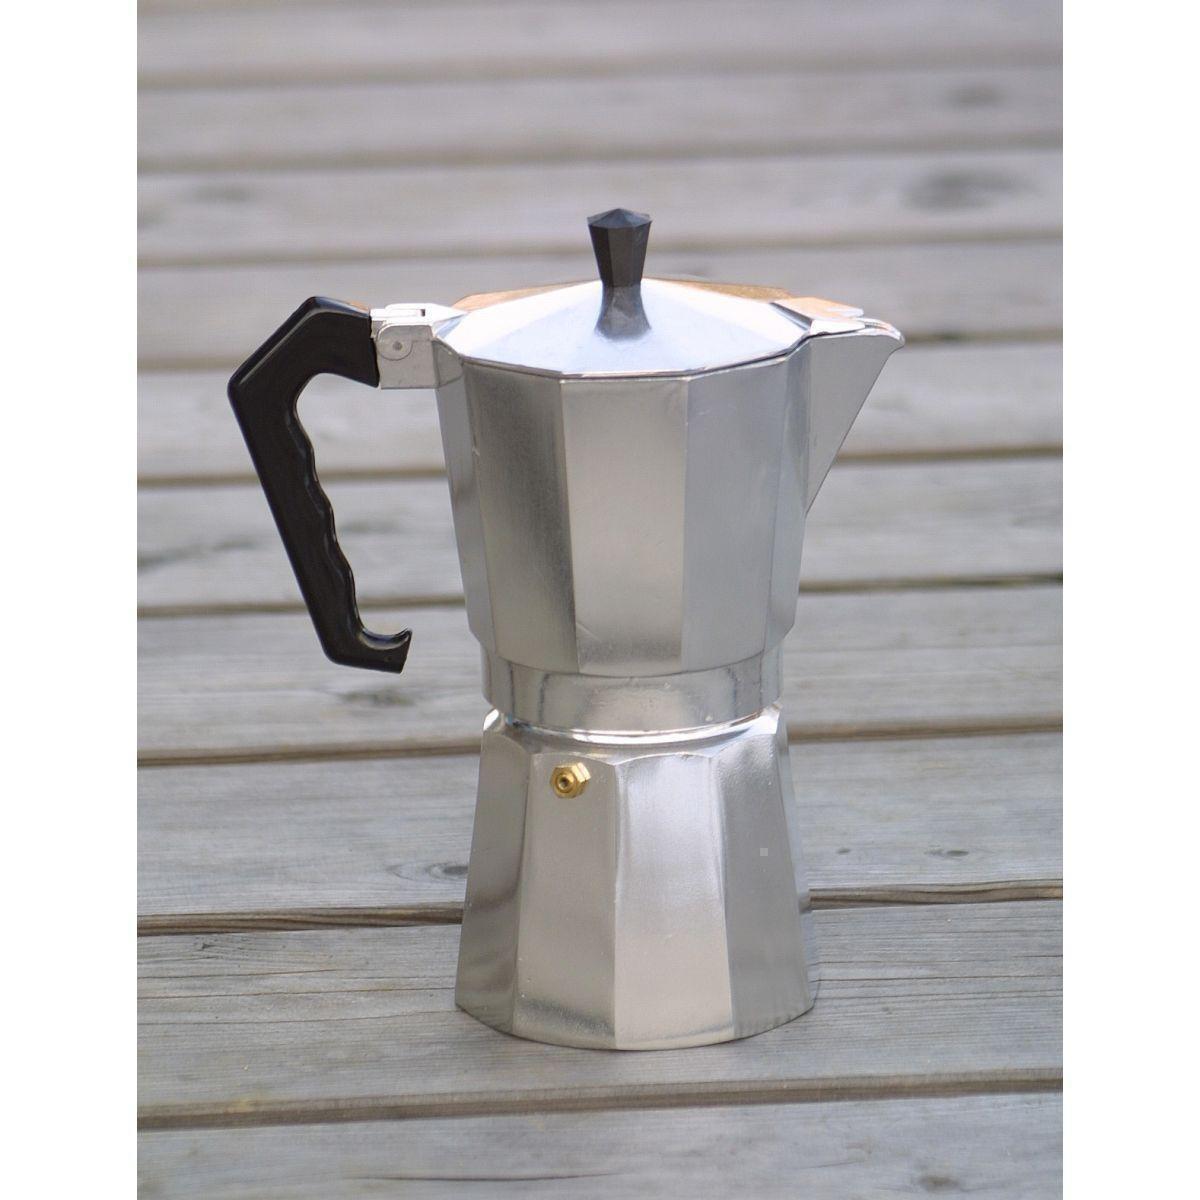 Tassen Maker Amsterdam : Relags espresso maker bellanapoli tassen bei outdoor